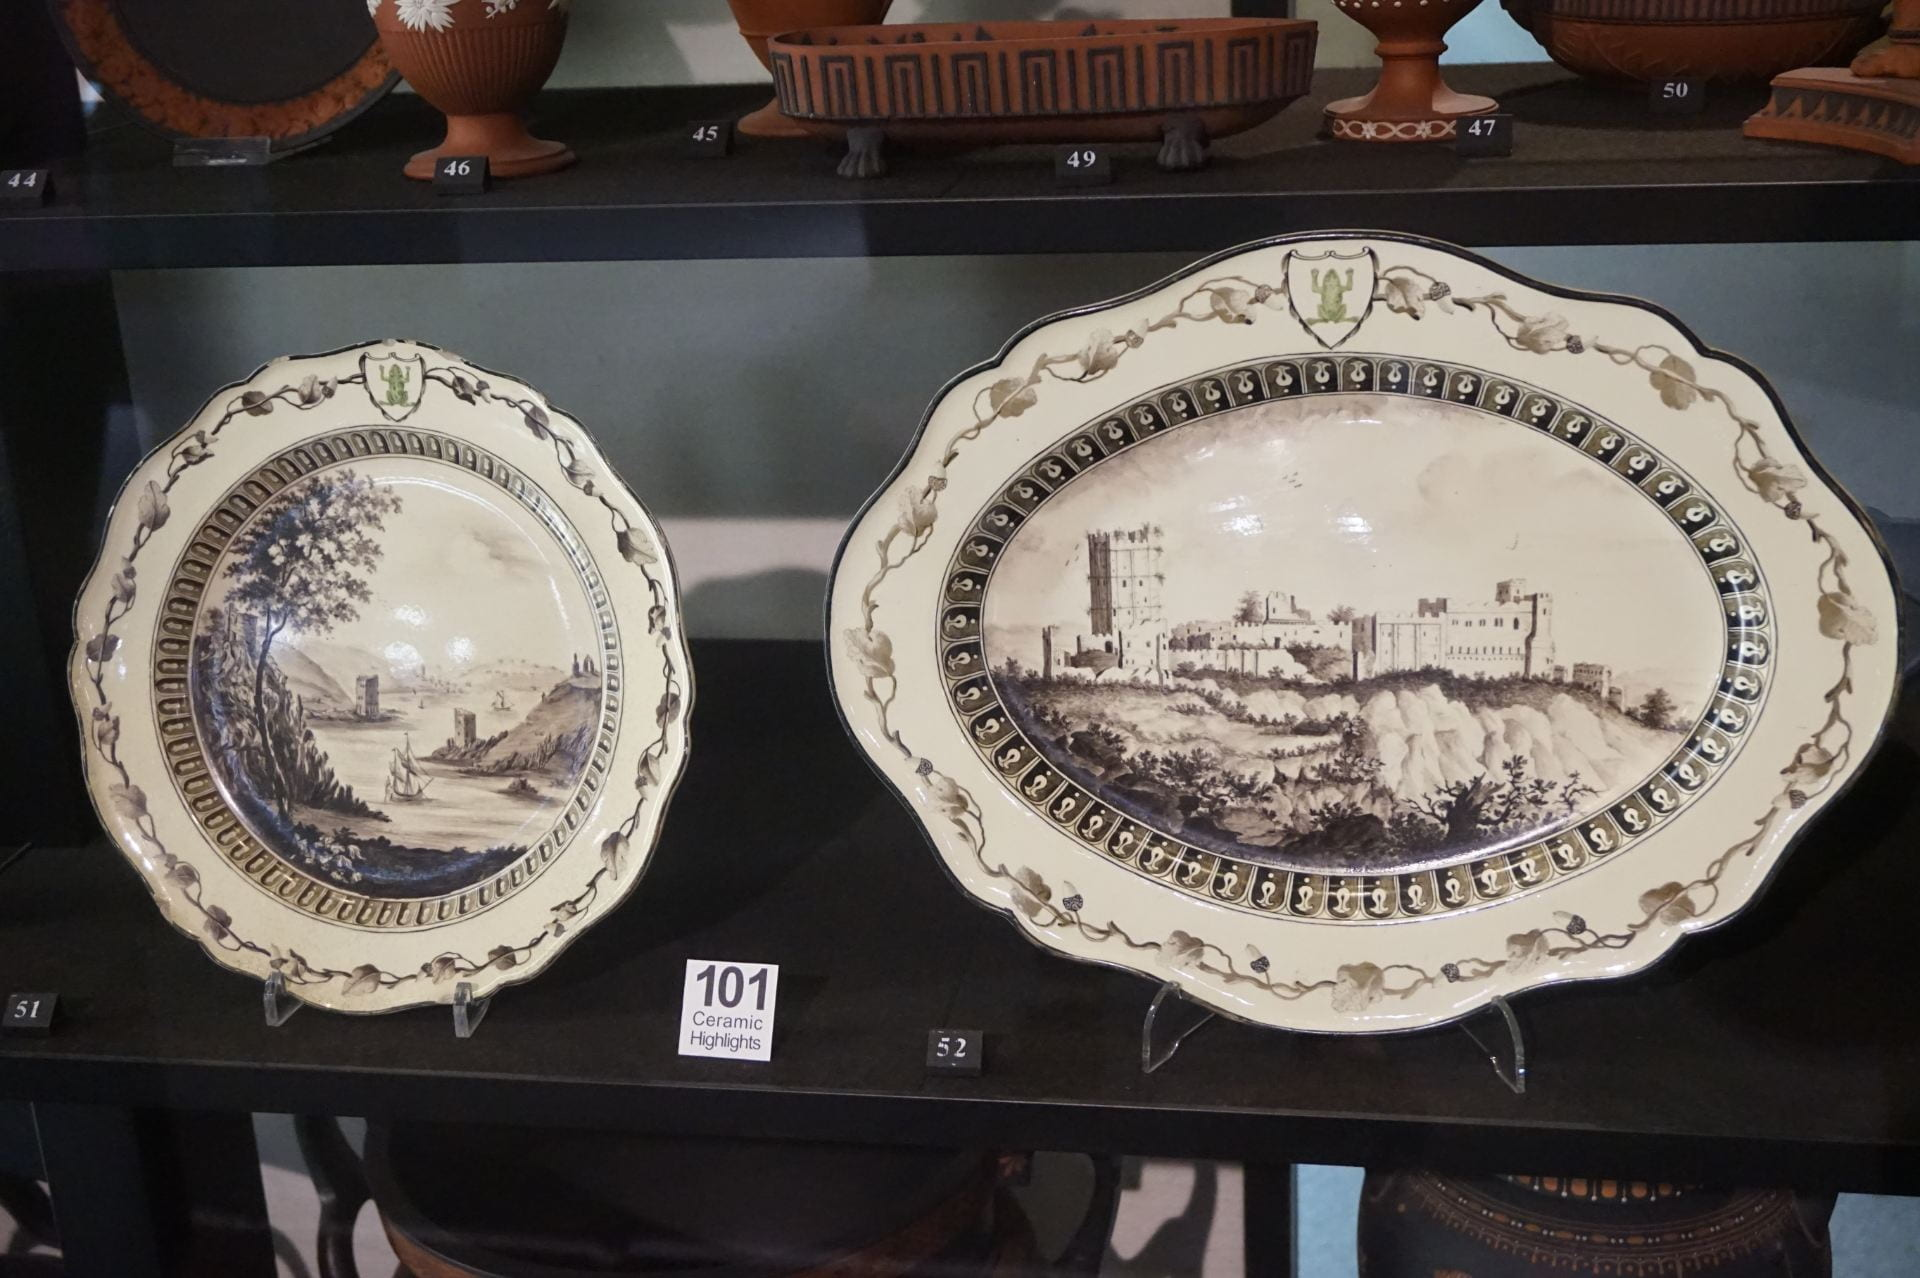 two black and white transferware plates